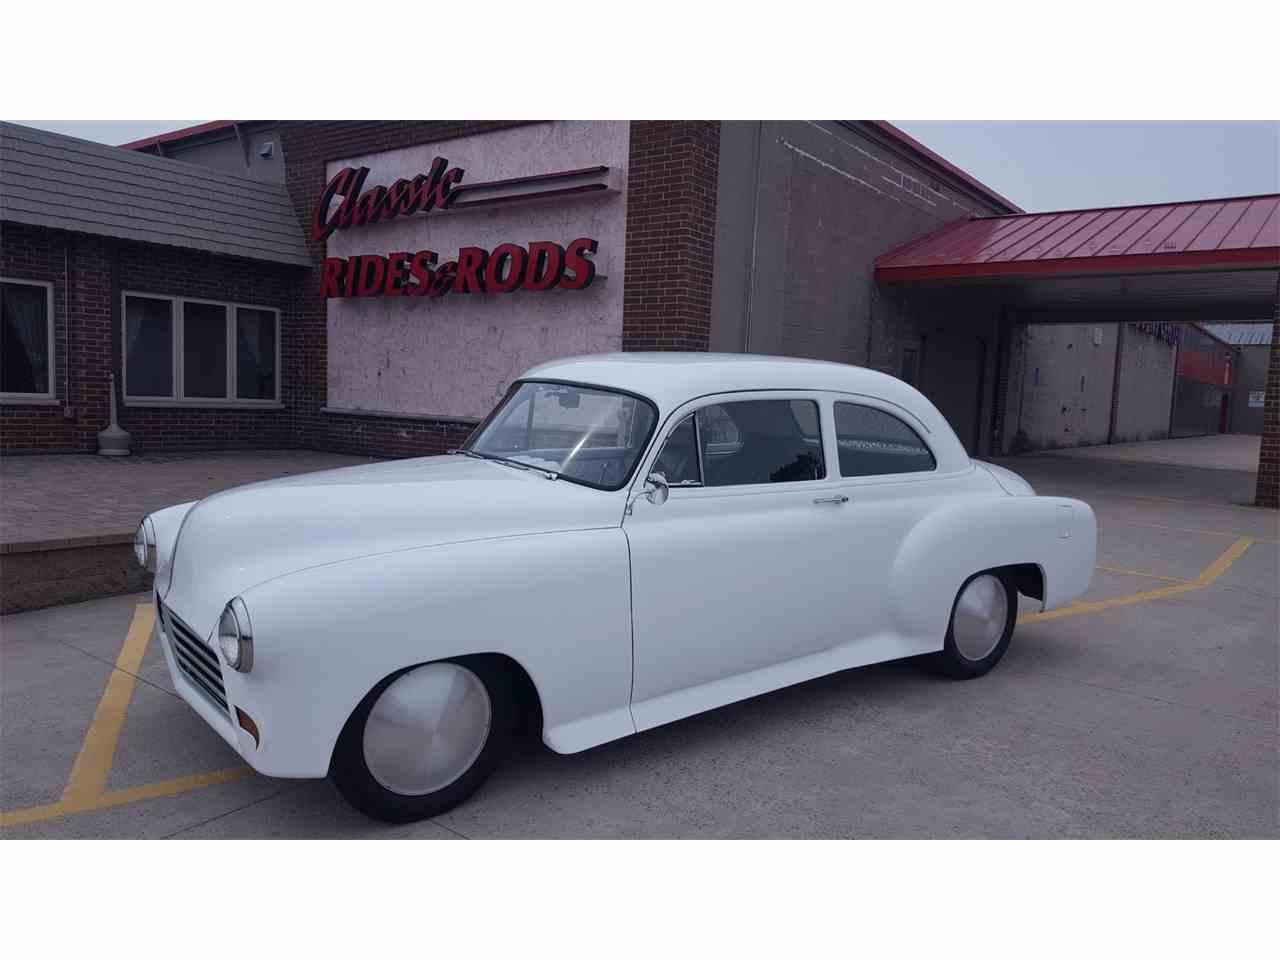 1951 Chevrolet 1 Ton Pickup for Sale | ClassicCars.com | CC-1011461